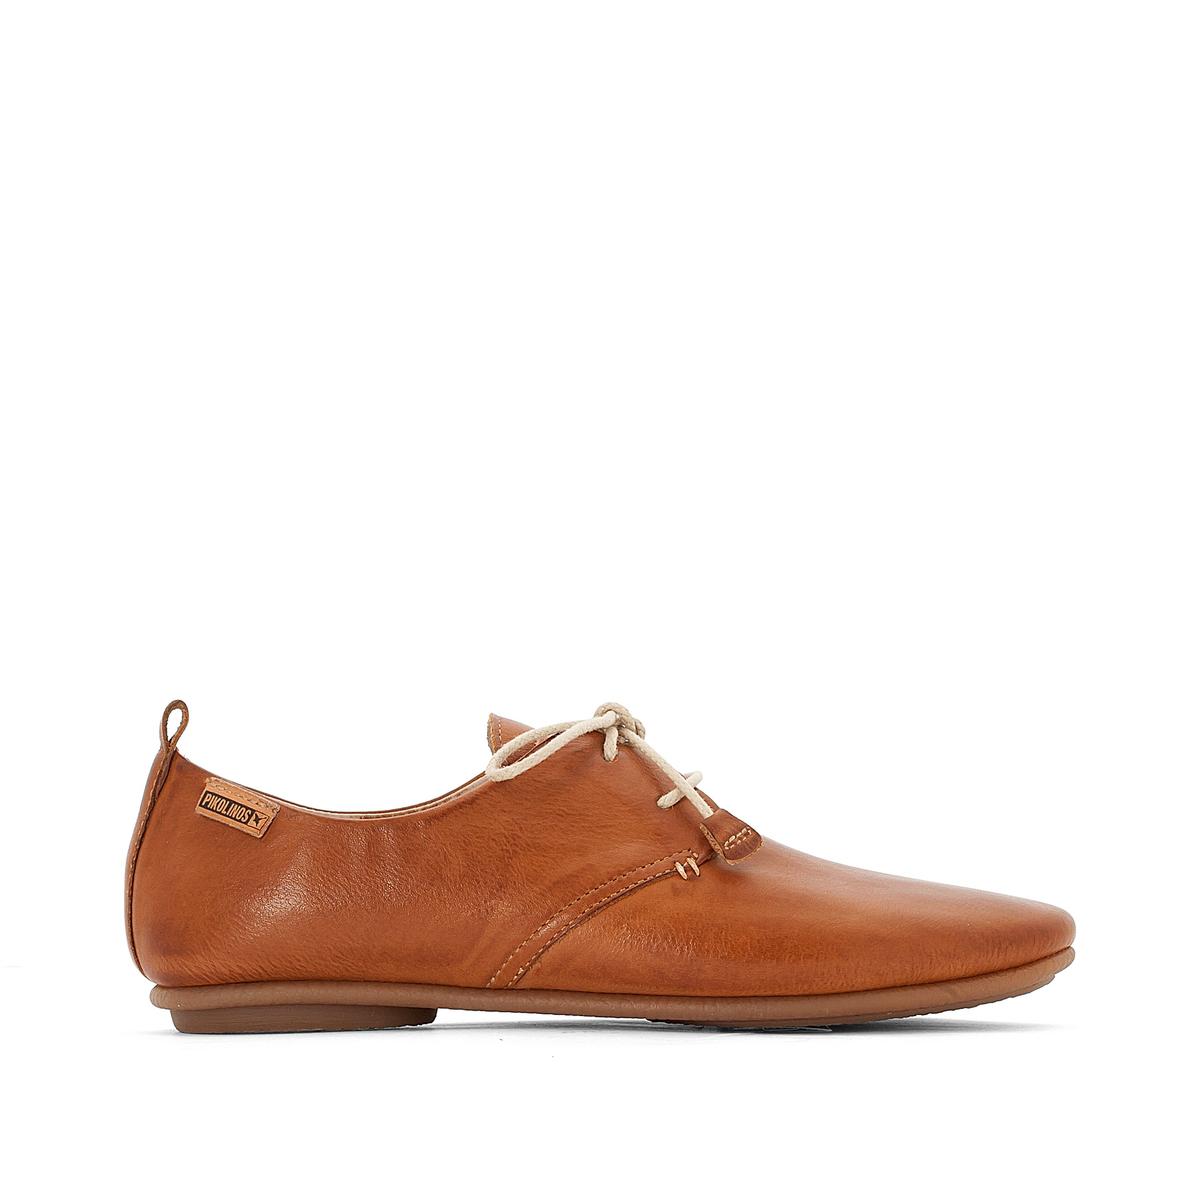 Ботинки-дерби кожаные Calabria W9K ботинки дерби кожаные whitlock